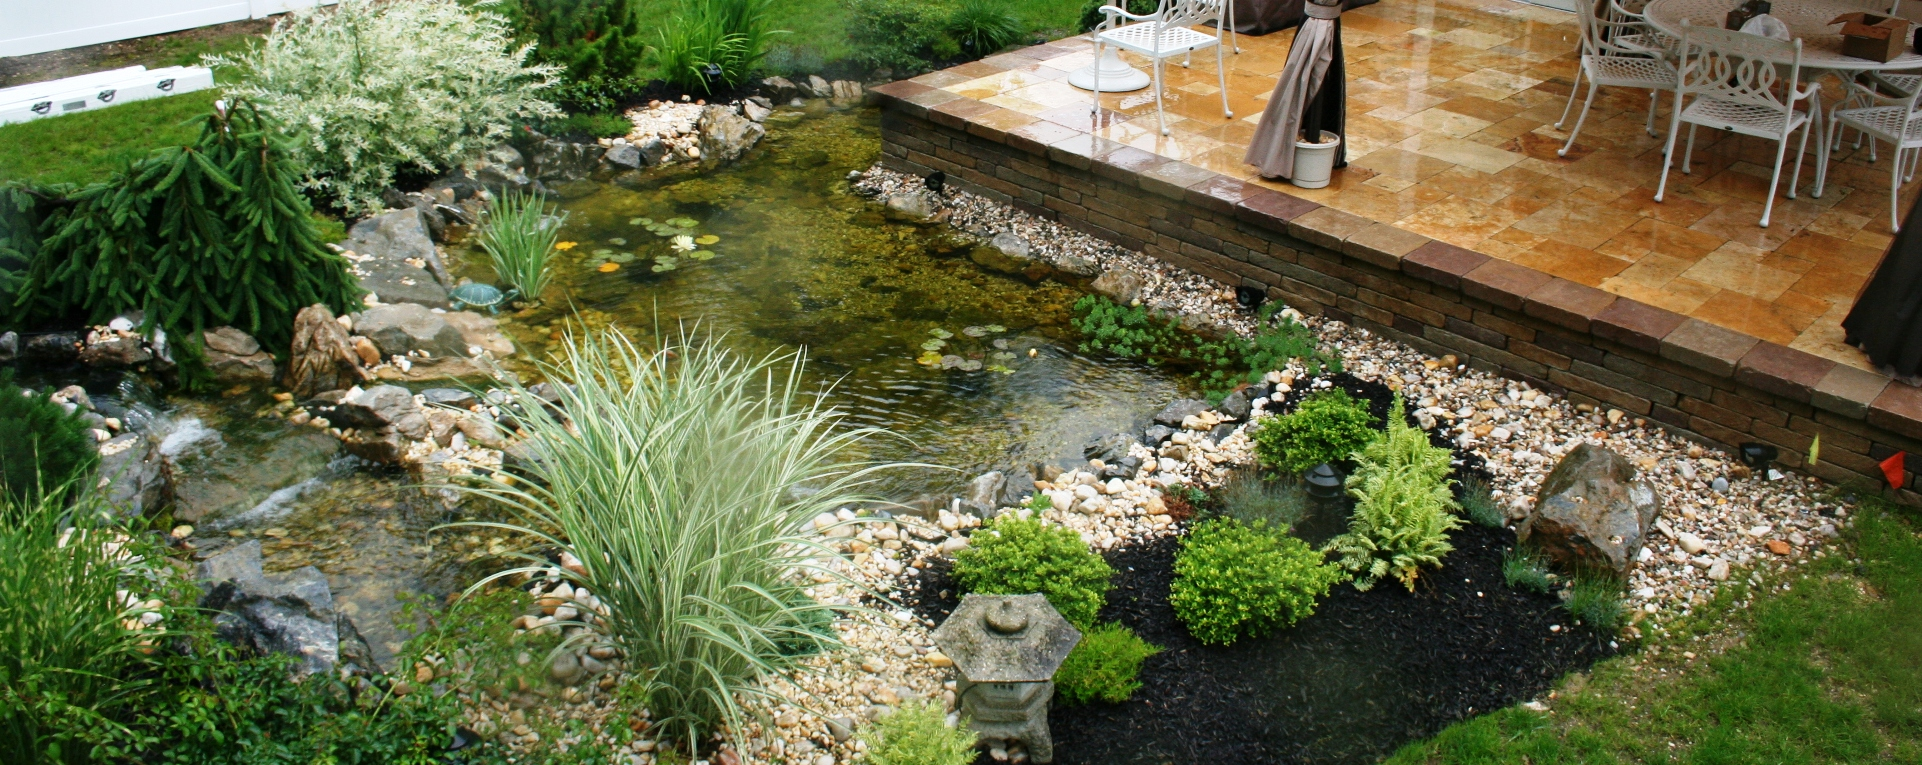 koi Pond | Backyard | Fish | supplier | landscape | Design ... on Backyard Koi Pond Designs  id=12613